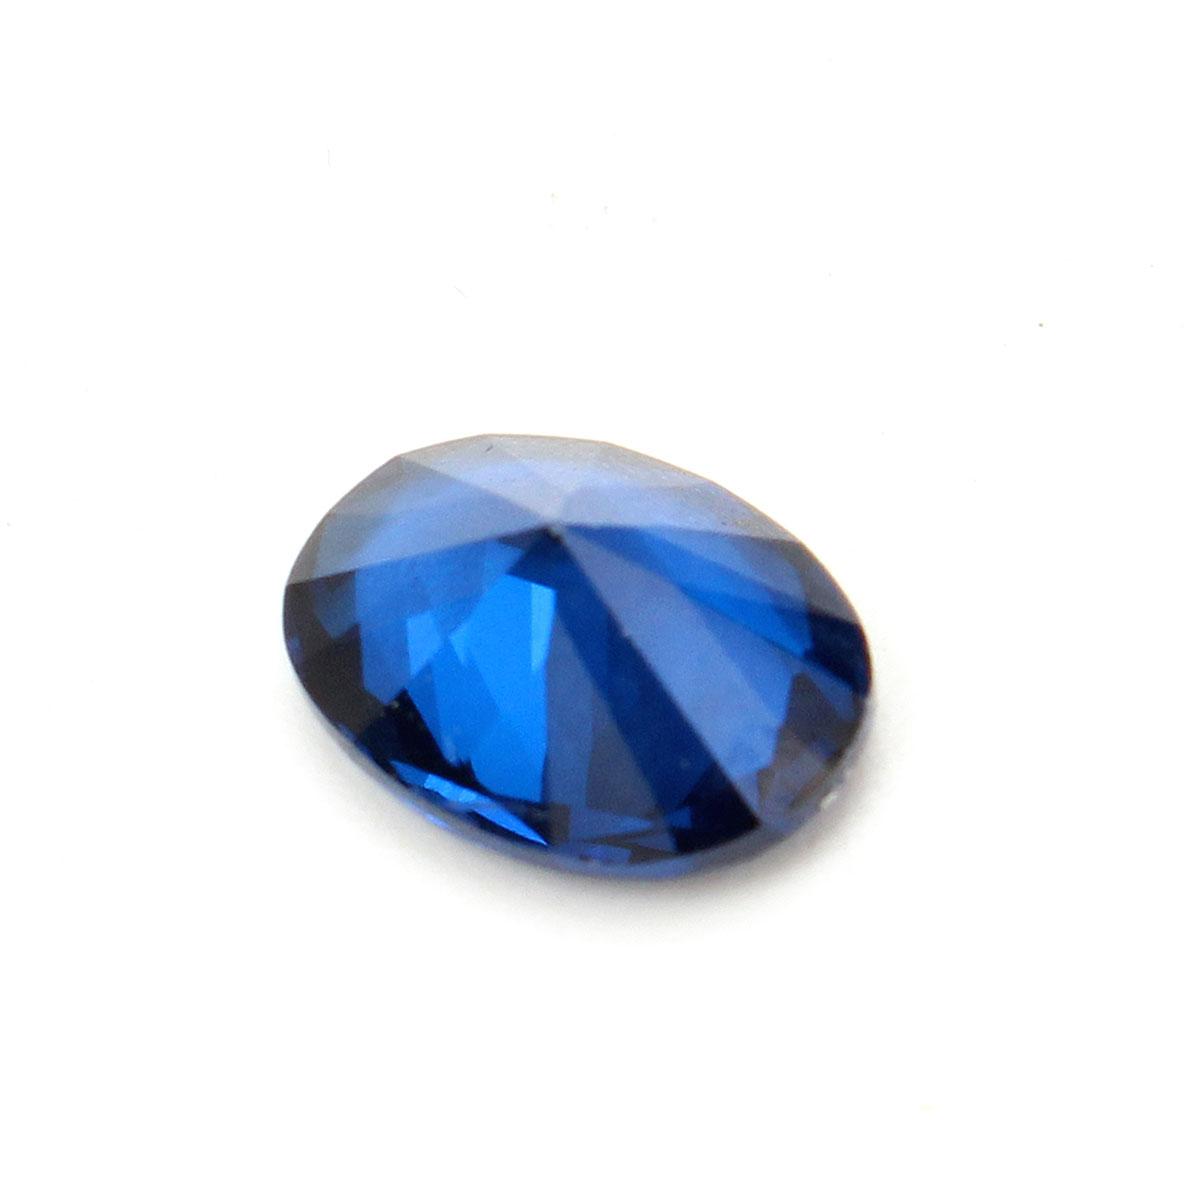 8x6mm Oval Dark Blue Gemstone DIY Design Lustrous Jewelry